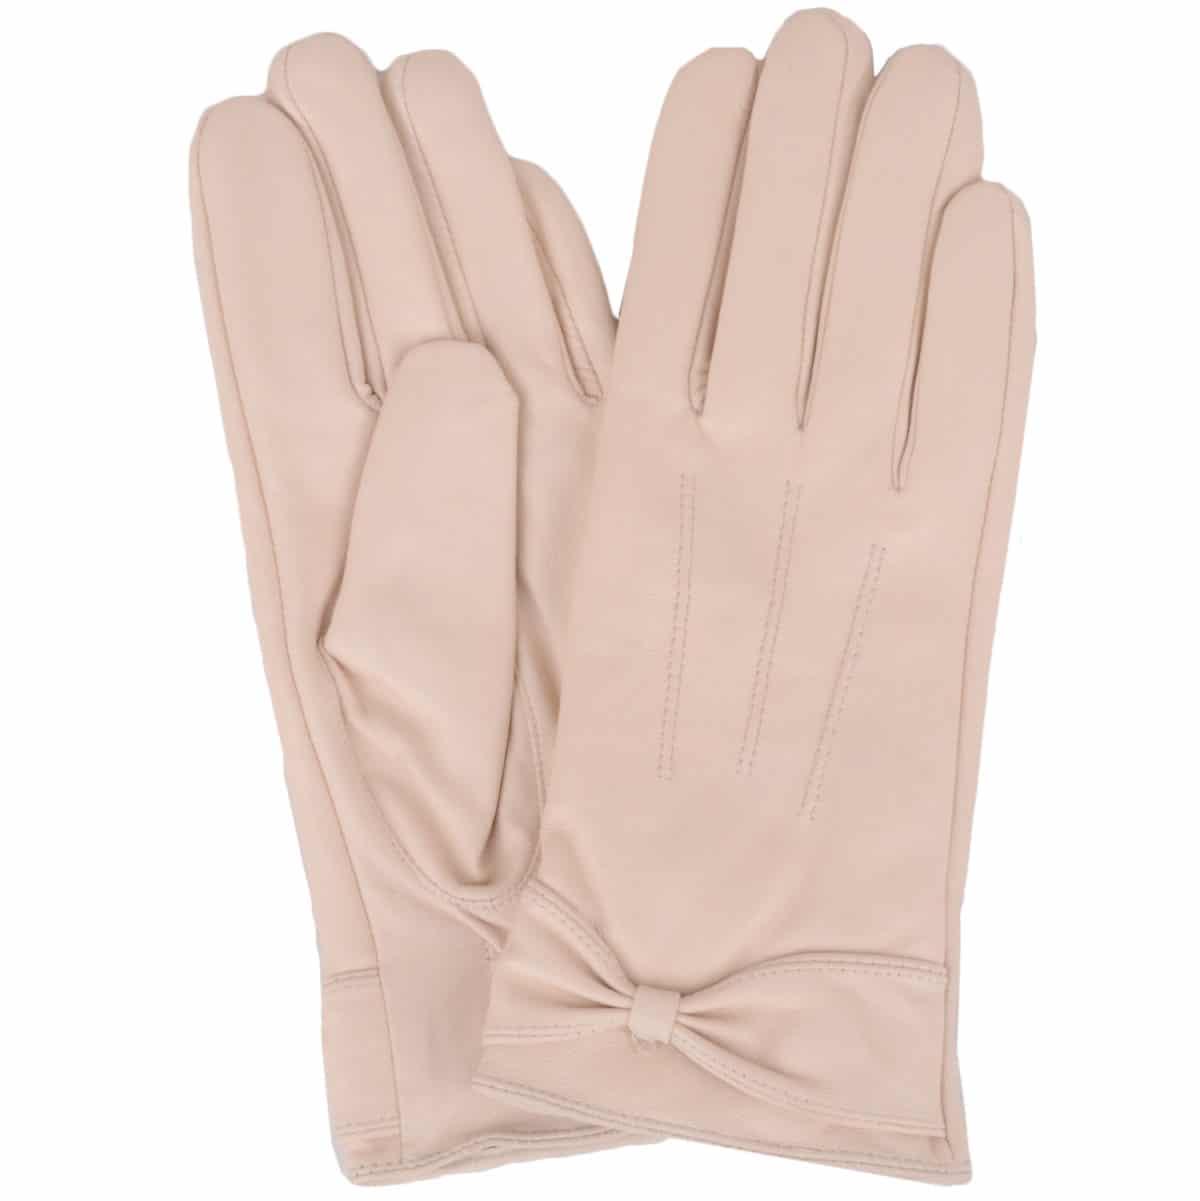 Alwen - Leather Gloves with Bow Design - Beige